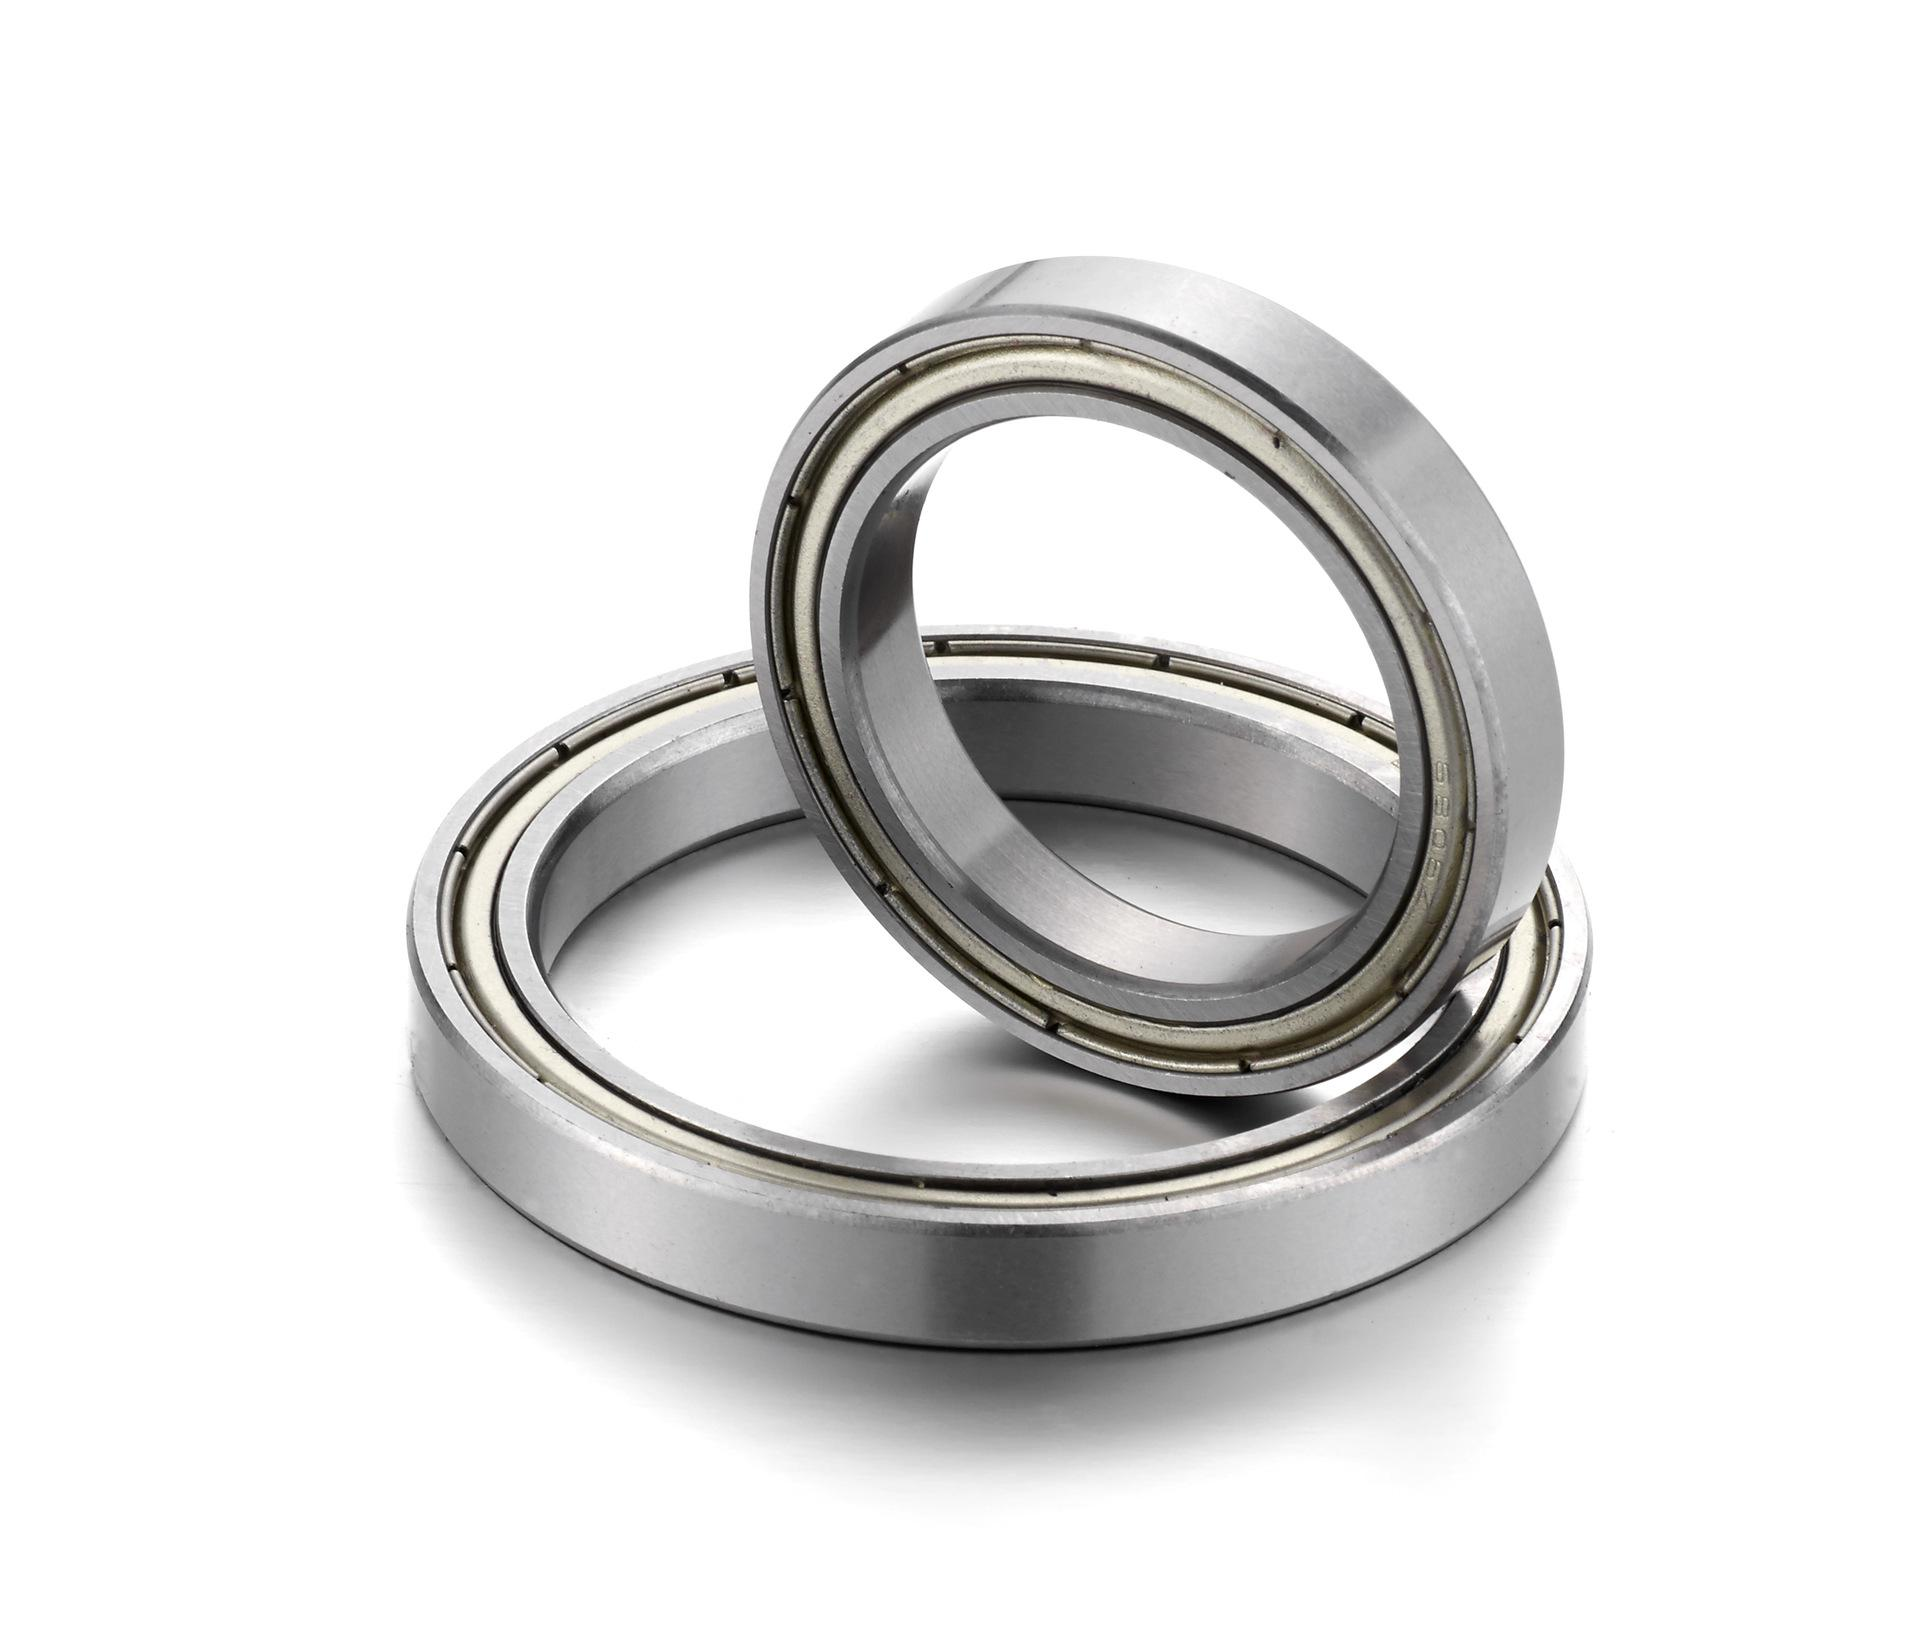 6830M ABEC-1 150x190x20mm Metric Thin Section Bearings 61830M Brass cage 1pcs 71822 71822cd p4 7822 110x140x16 mochu thin walled miniature angular contact bearings speed spindle bearings cnc abec 7